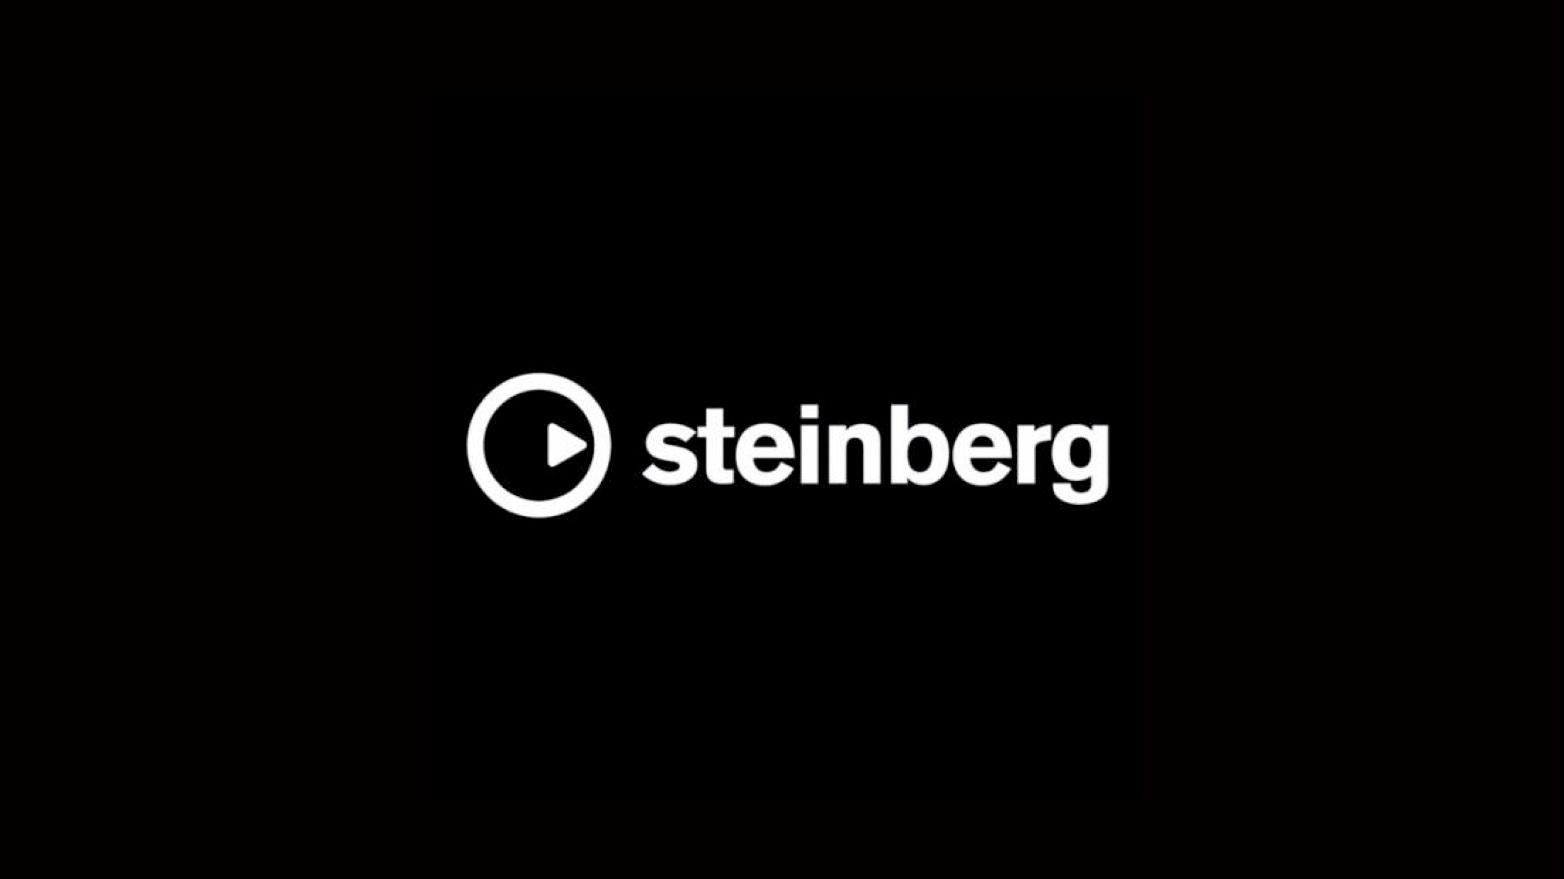 Steinberg+small.jpg